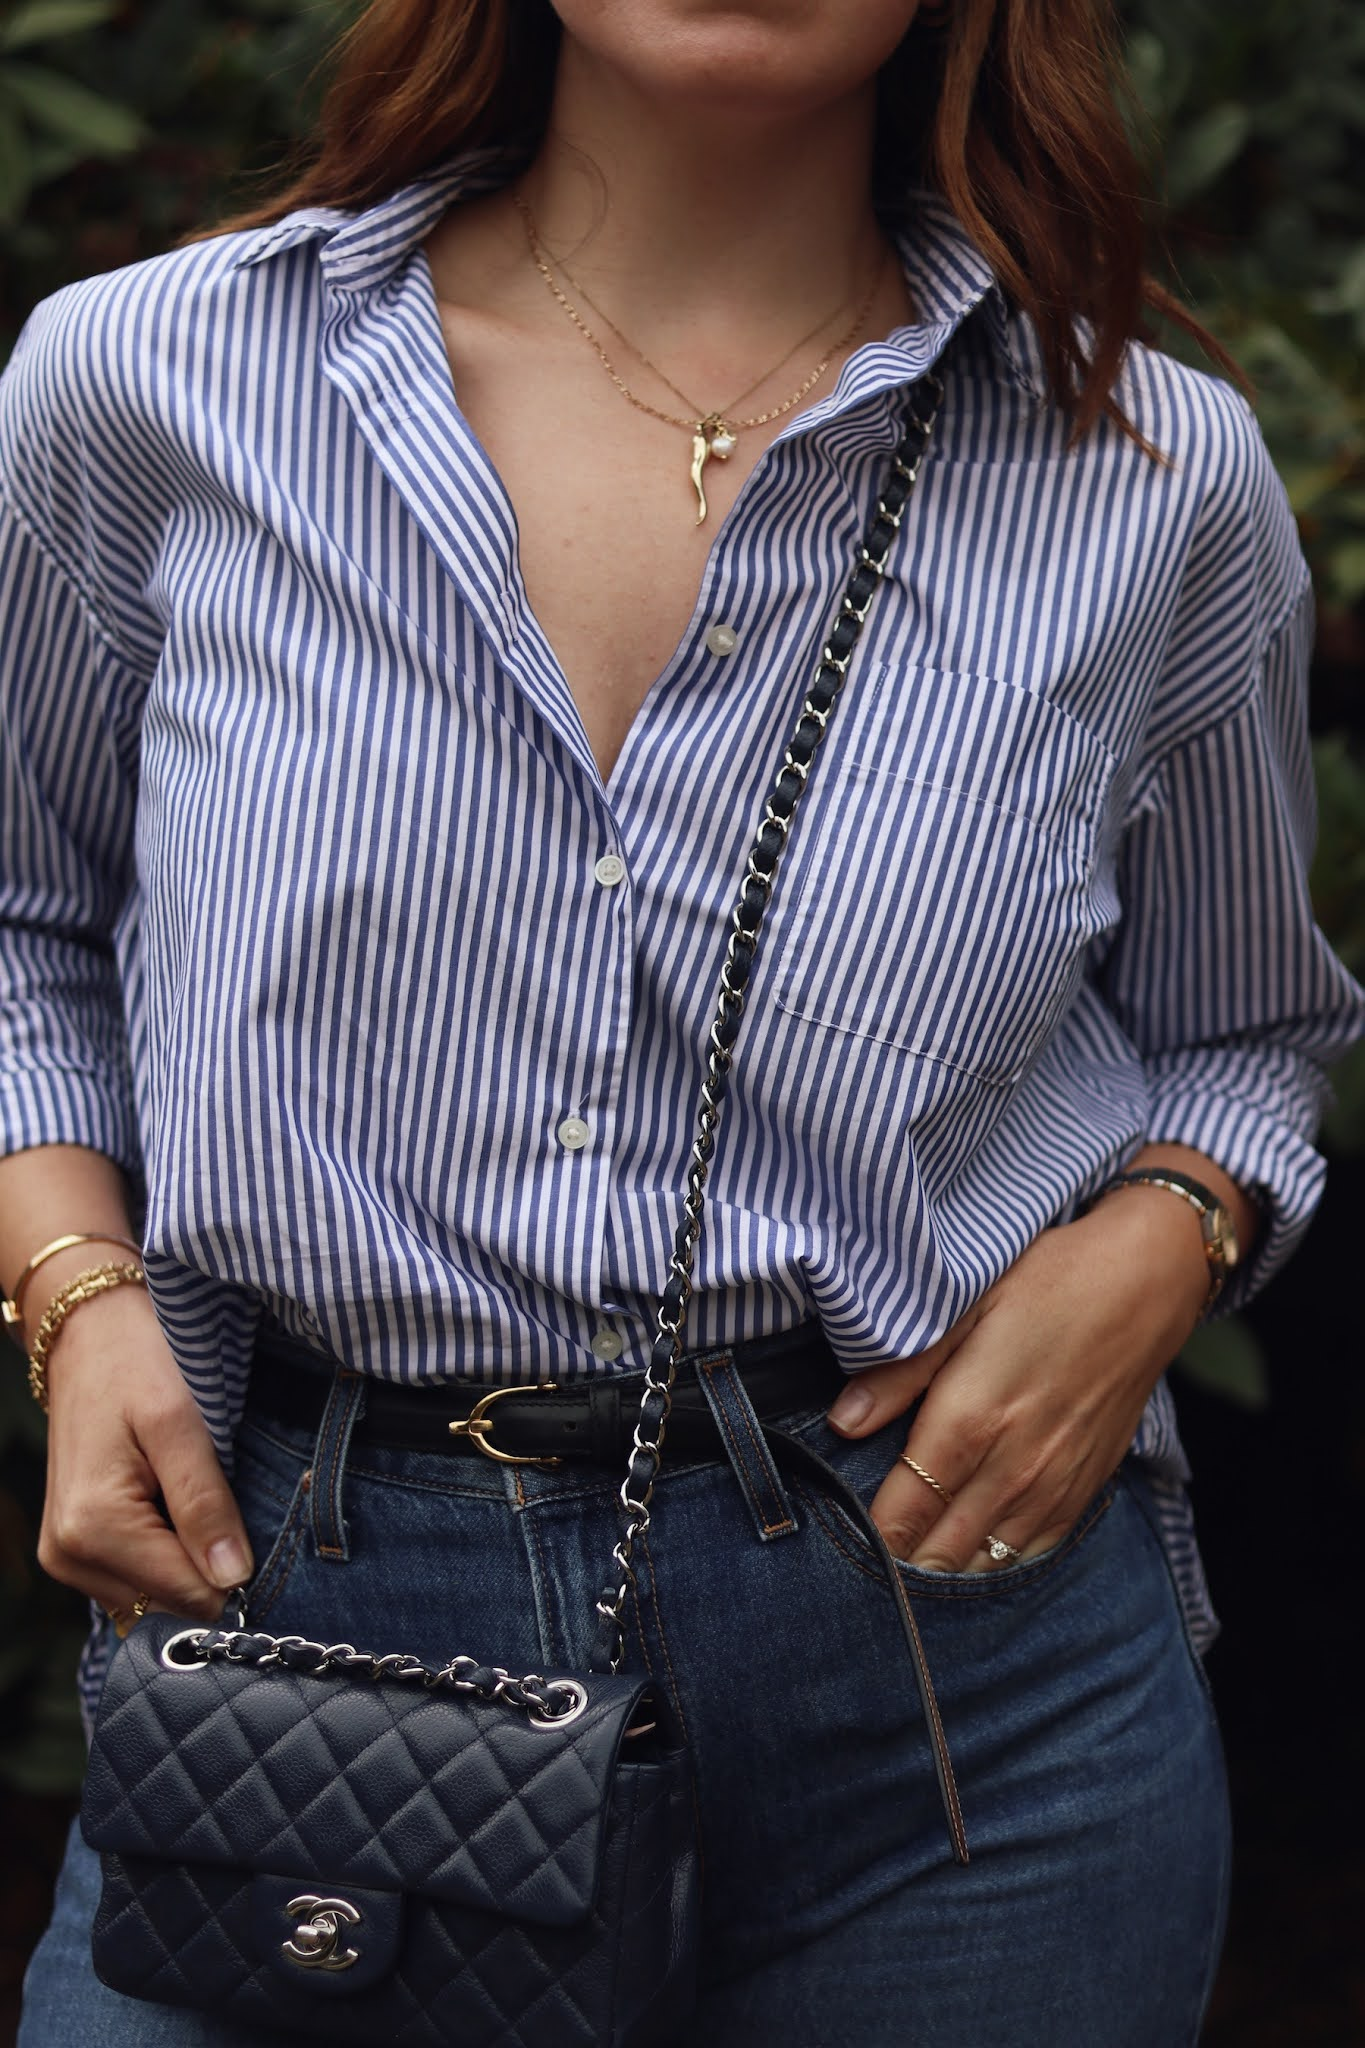 striped blouse levis dad jeans outfit chanel mini flap rectangle